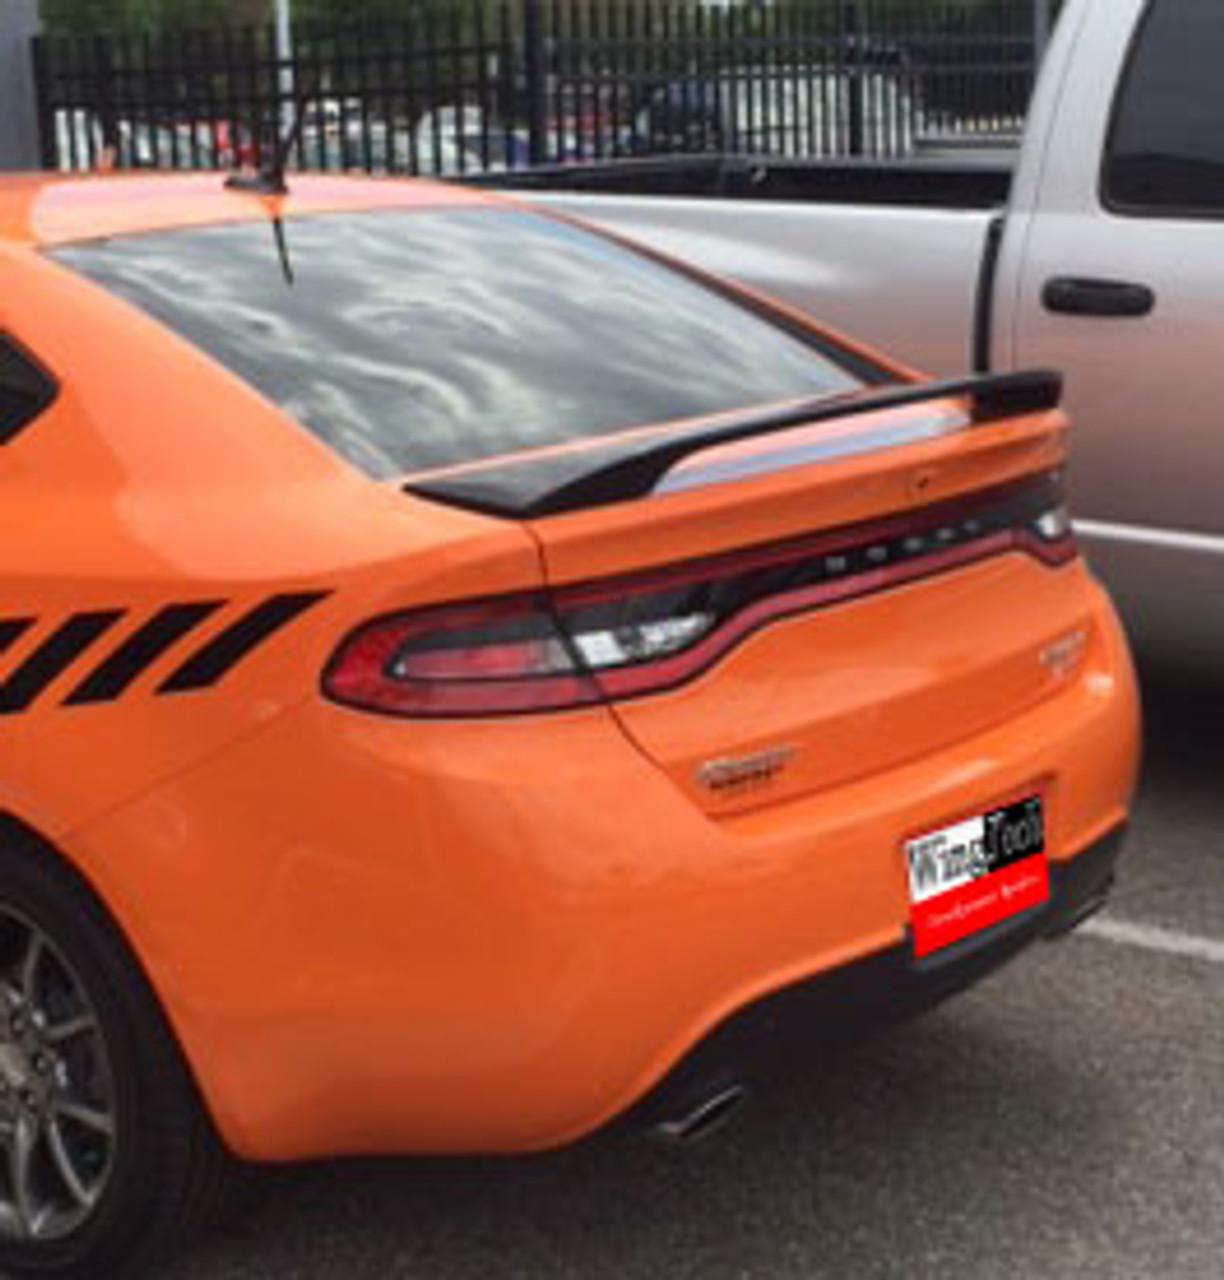 Painted Custom Spoiler Fits The 2013 2014 2015 2016 Dodge Dart Motors Auto Parts Accessories